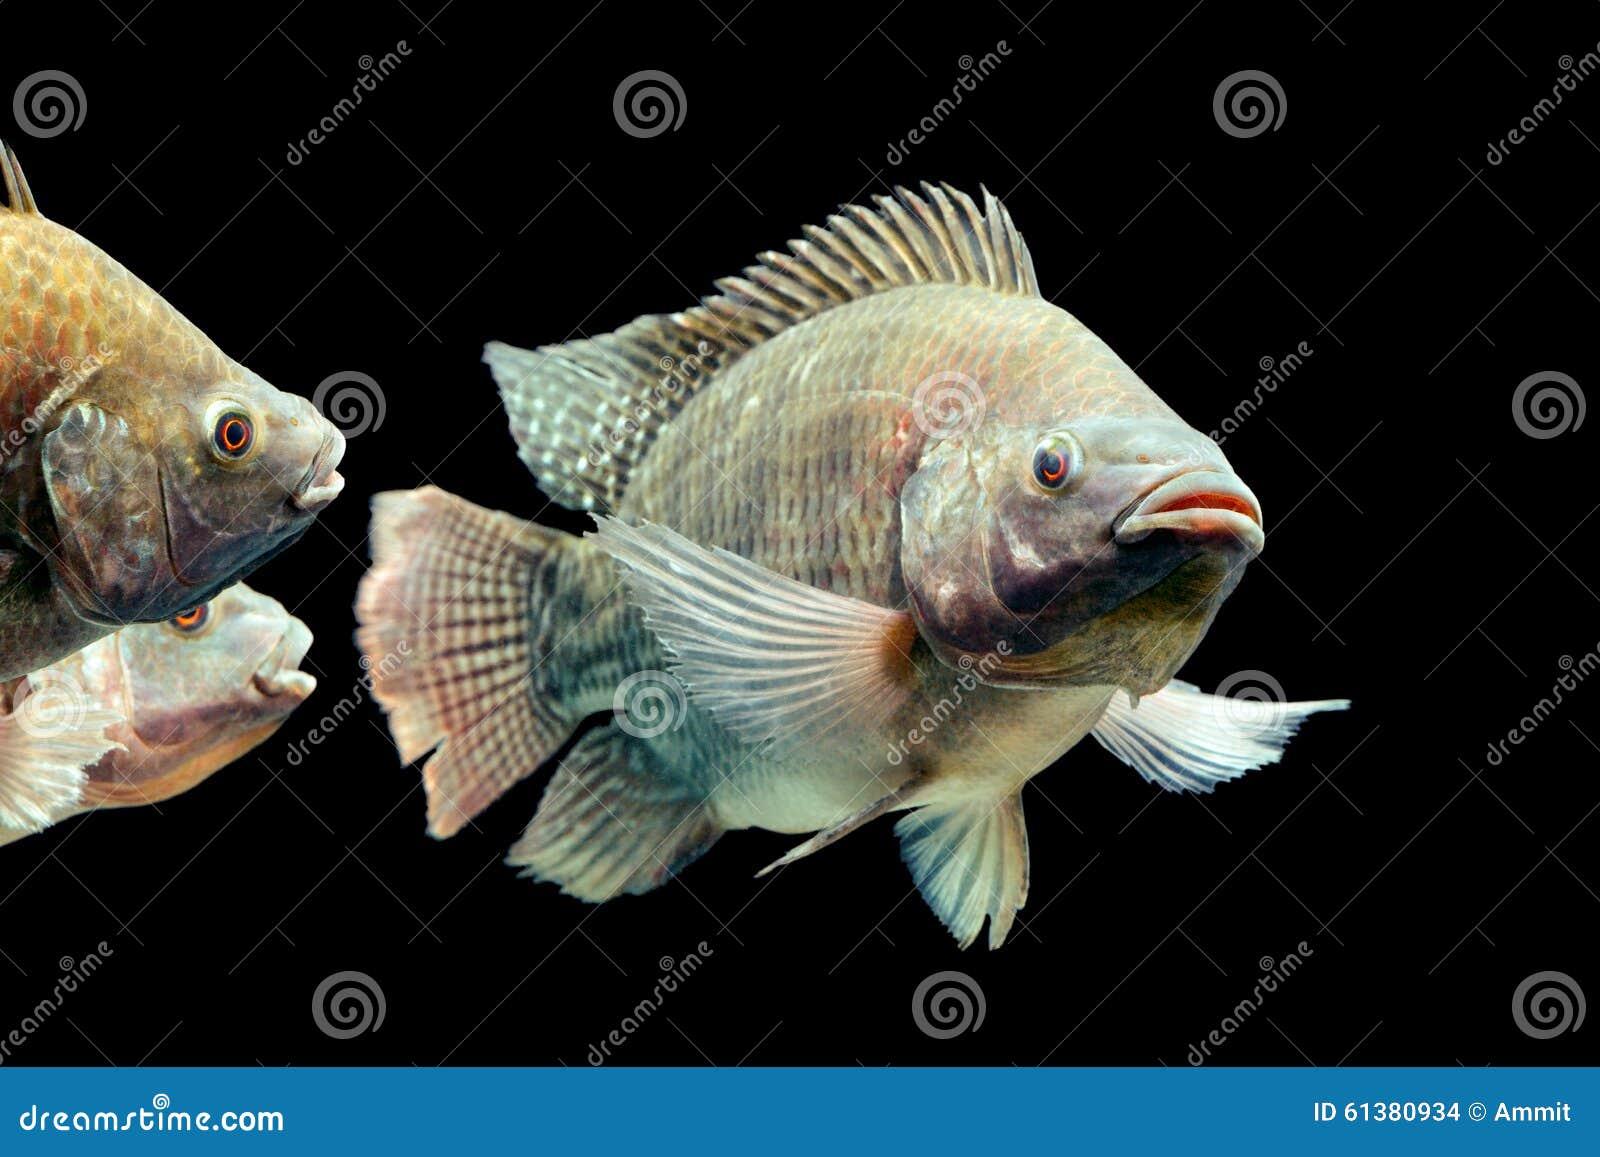 Oreochromis mossambicus tilapia fish stock photo image for Tilapia aquarium